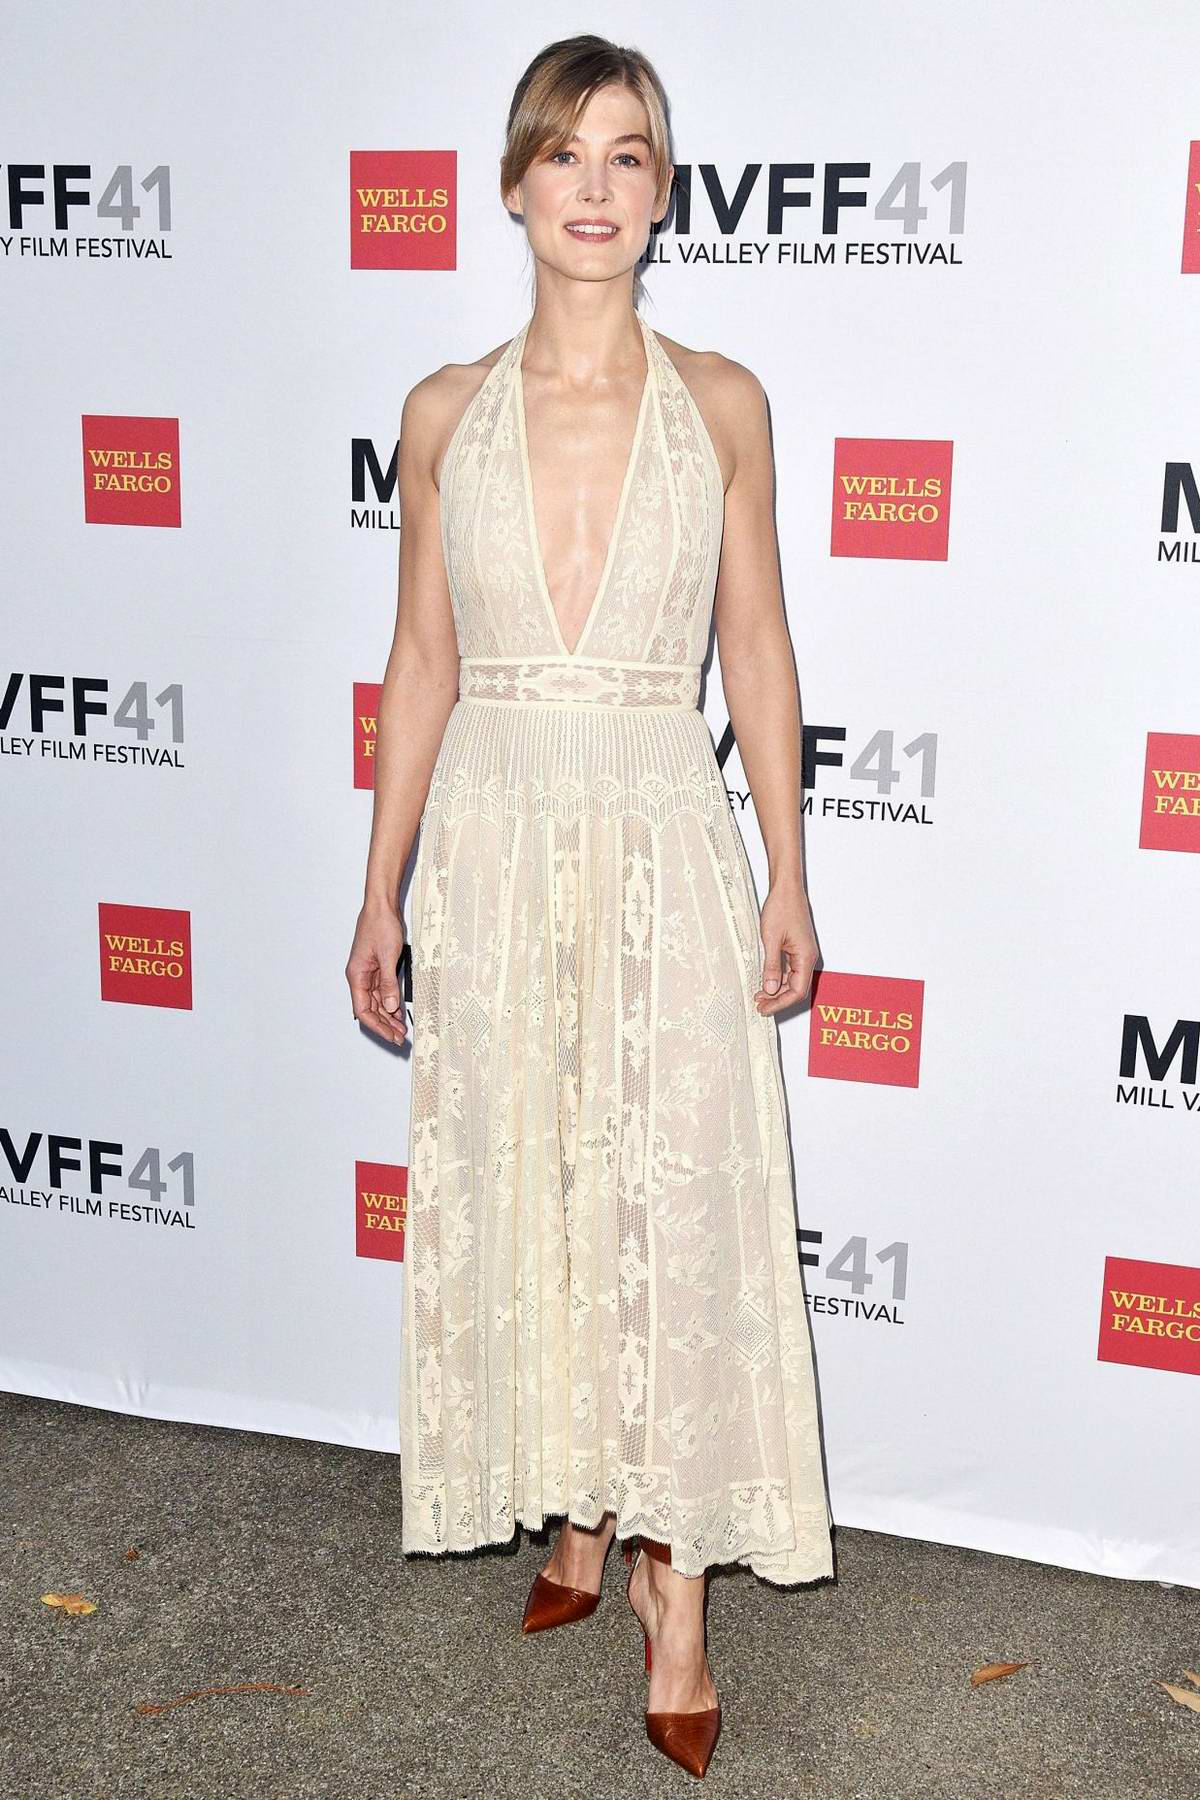 Rosamund Pike attends Mill Valley Film Festival (MVFF) Opening Reception in Mill Valley, California